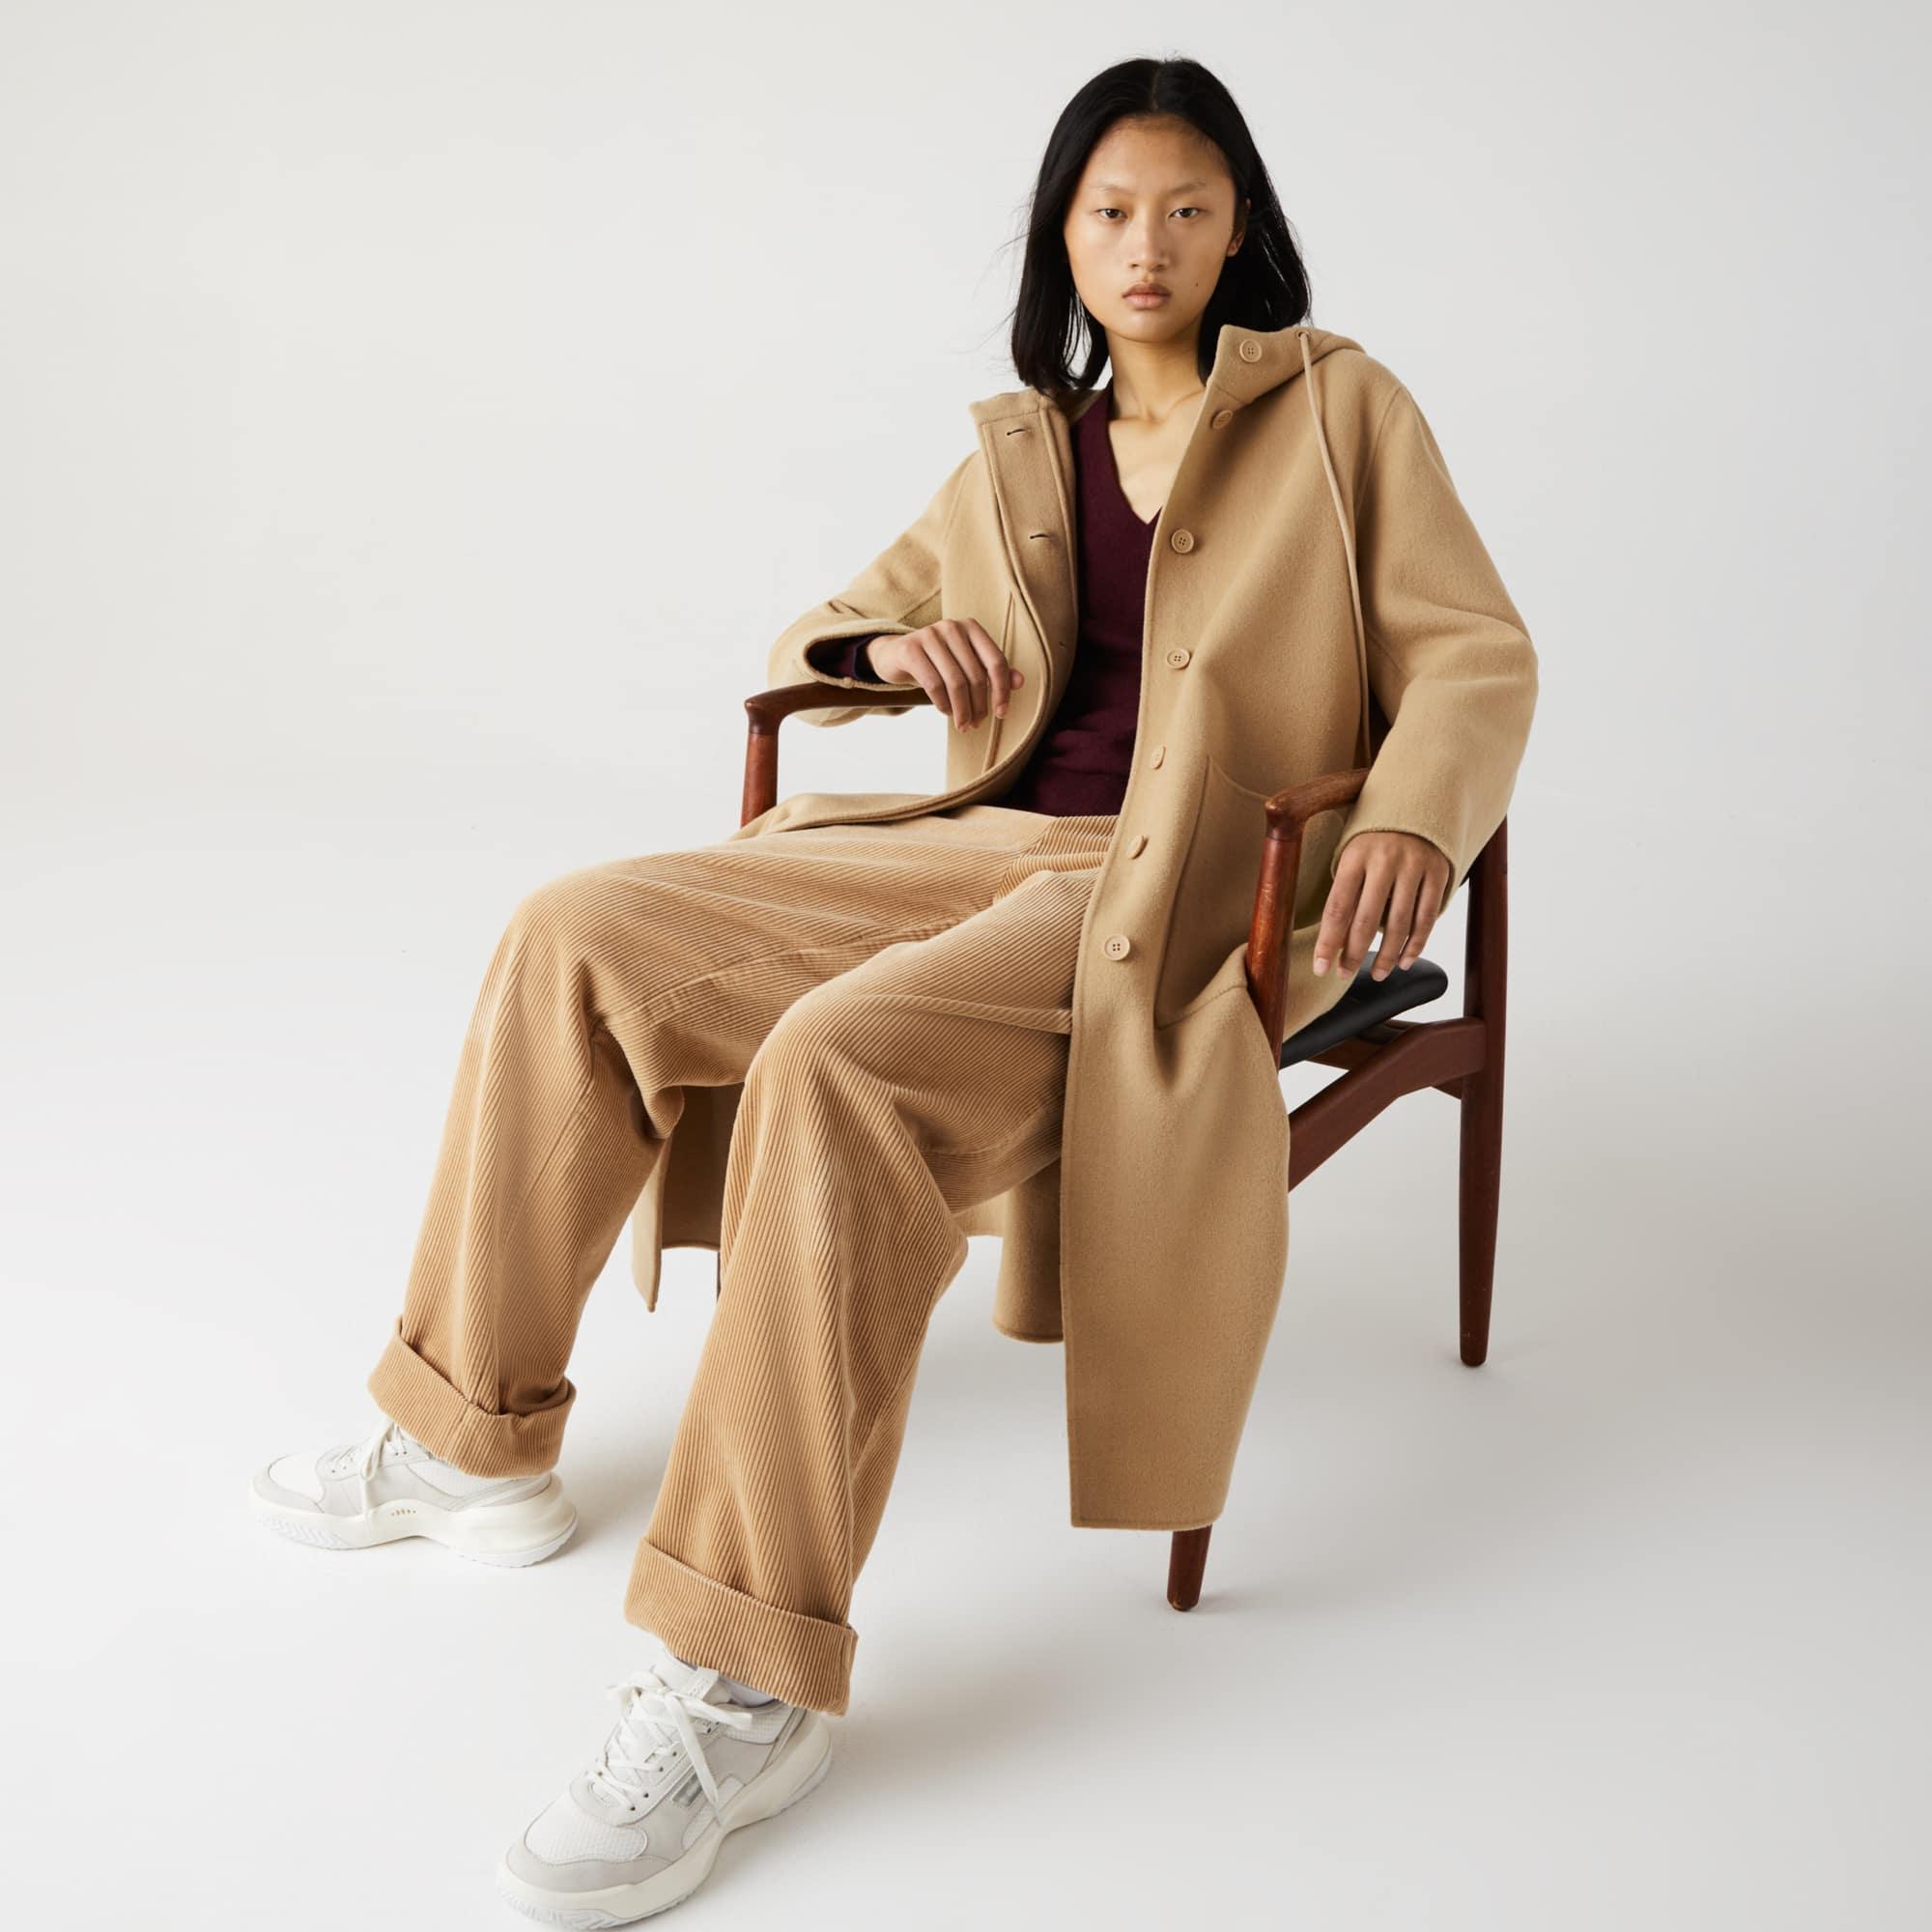 Lacoste Womens Hooded Zippered Long Wool Blend Coat